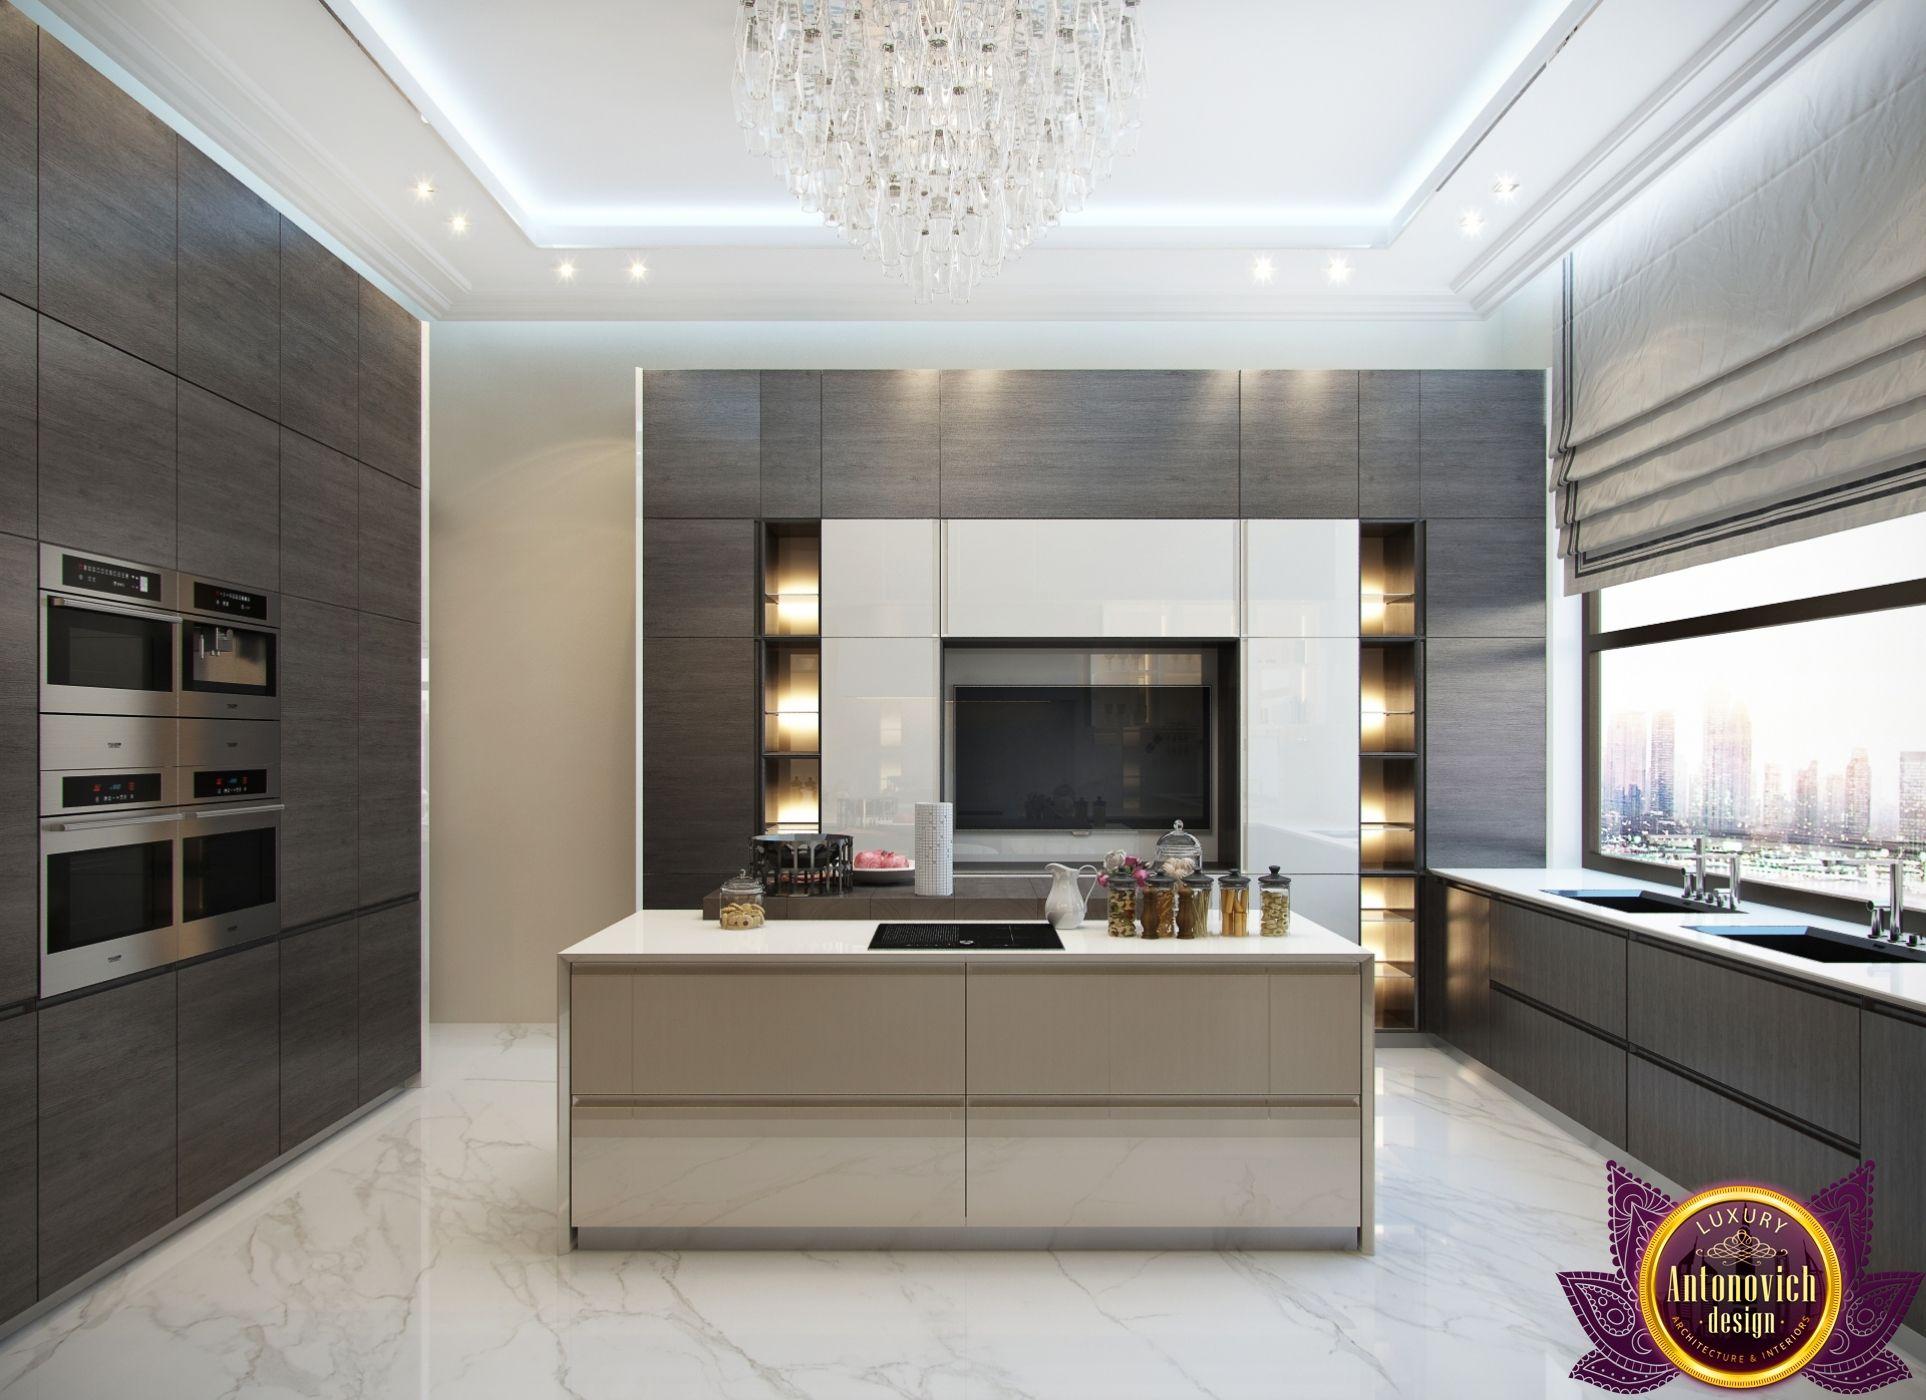 Kitchen Design In Dubai Contemporary Kitchen Interior Photo 3 House Furniture Design Contemporary Kitchen Interior Modern Kitchen Design